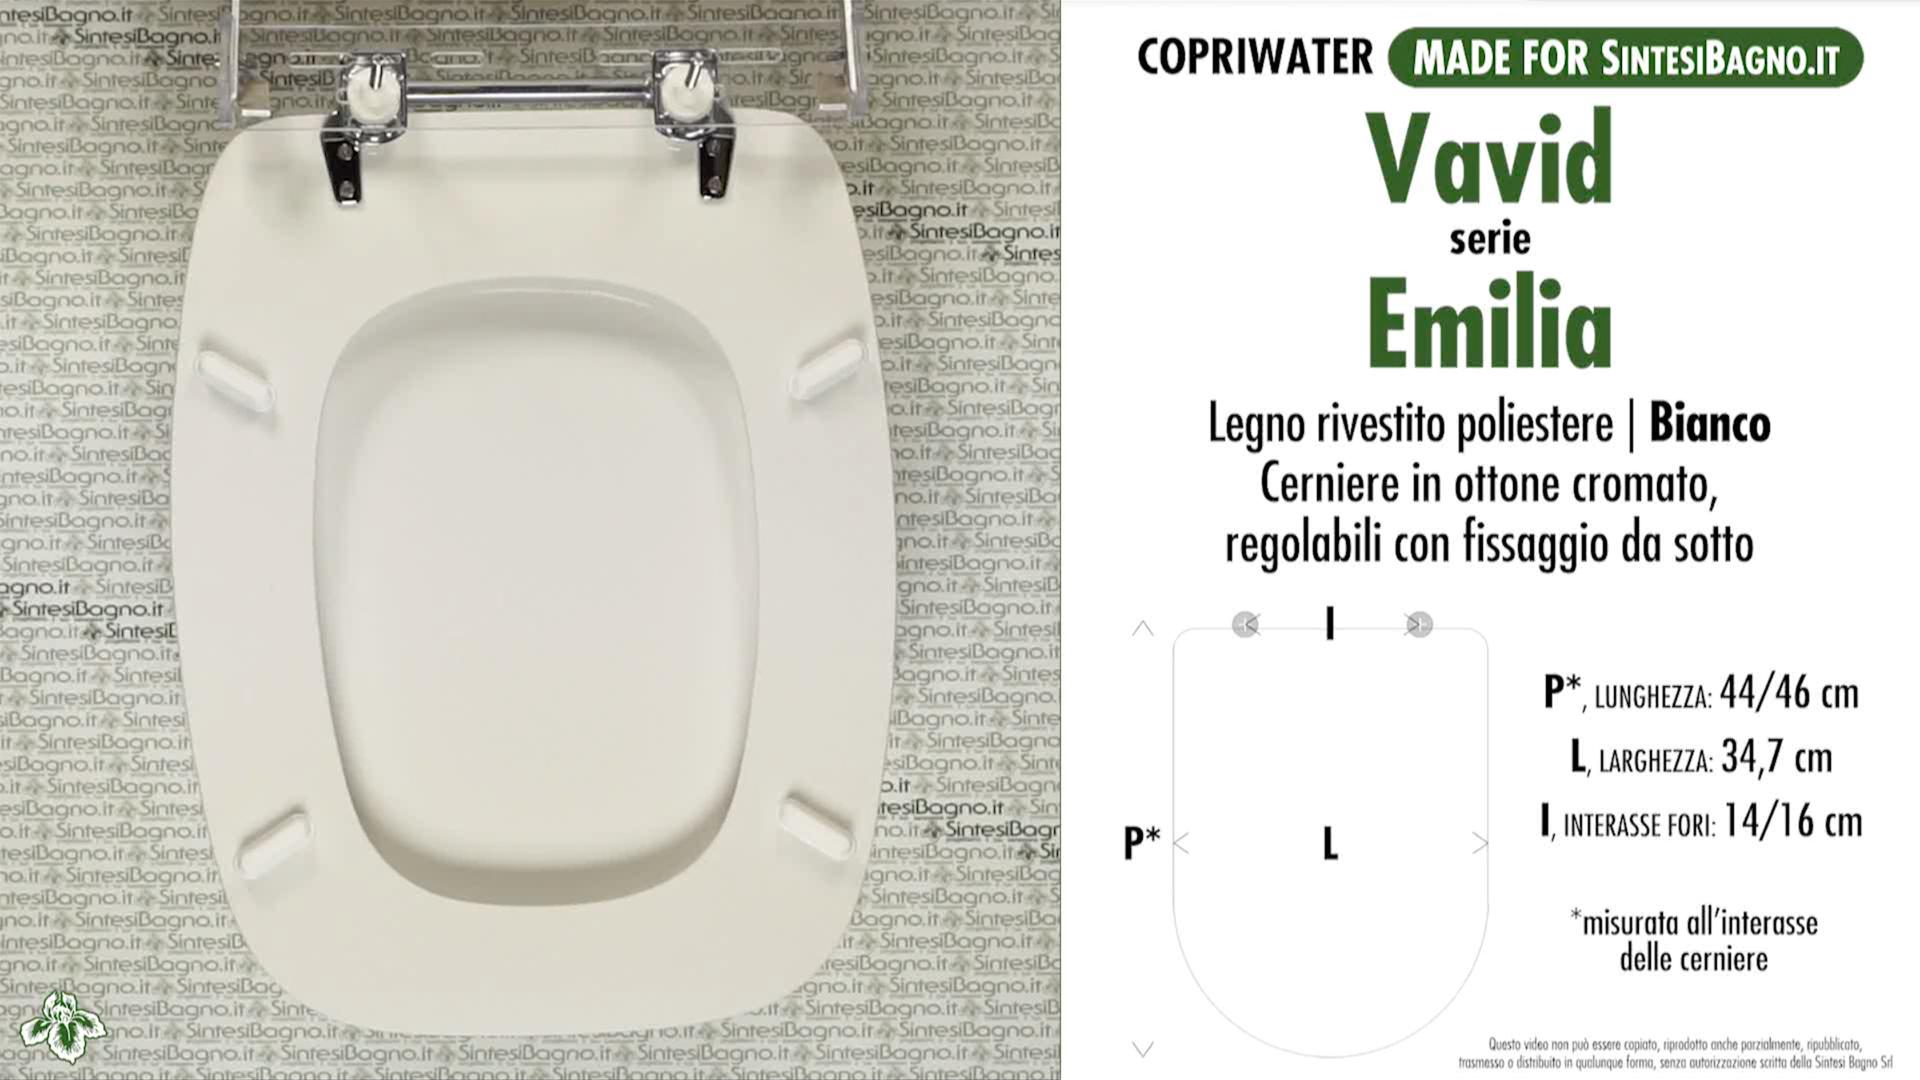 SCHEDA TECNICA MISURE copriwater VAVID EMILIA